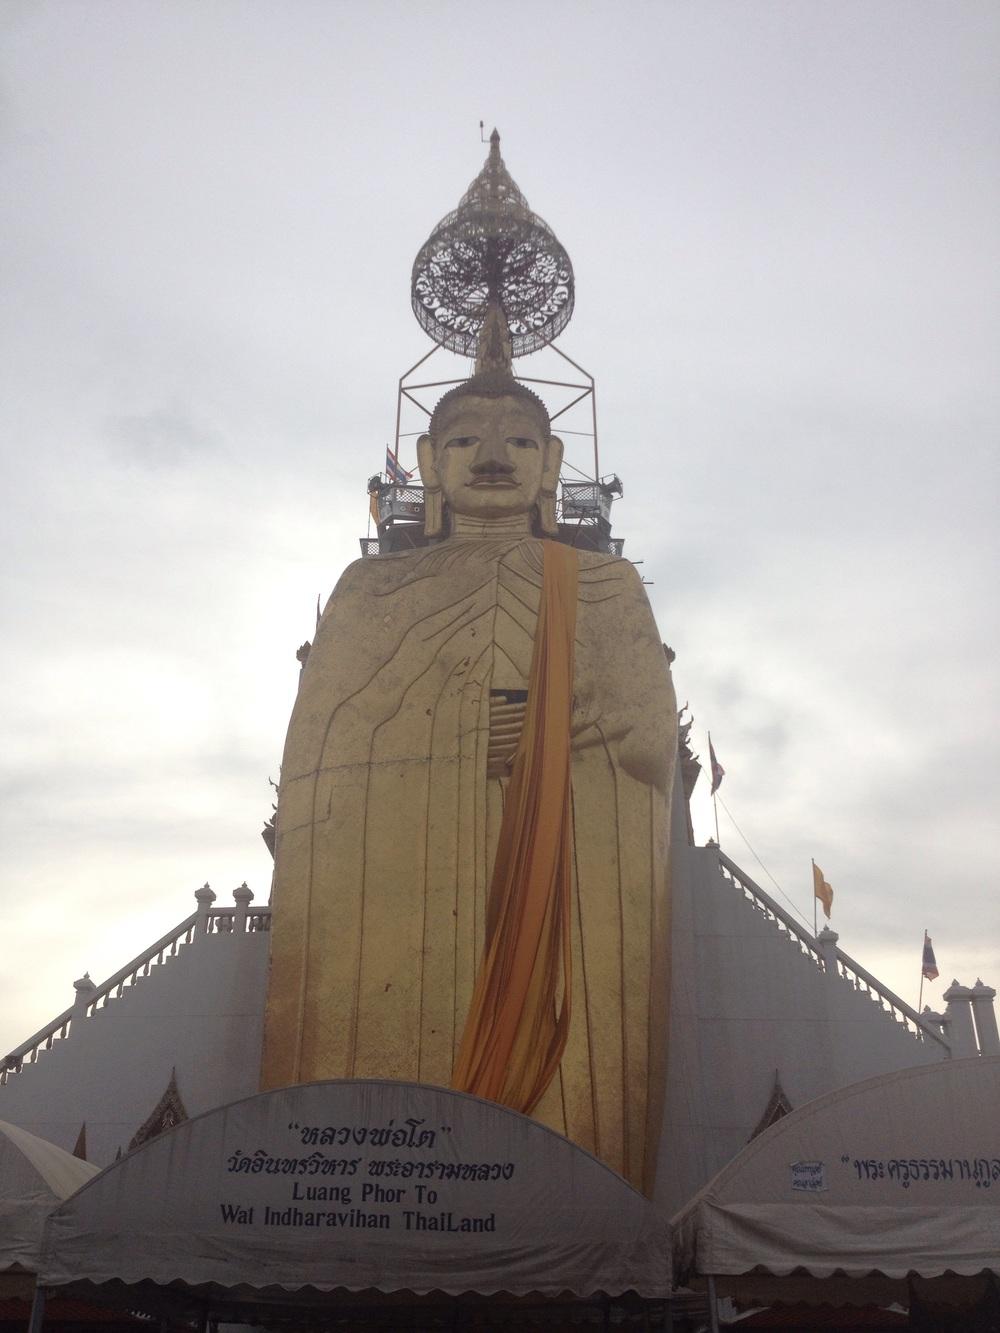 Huge gold Buddah